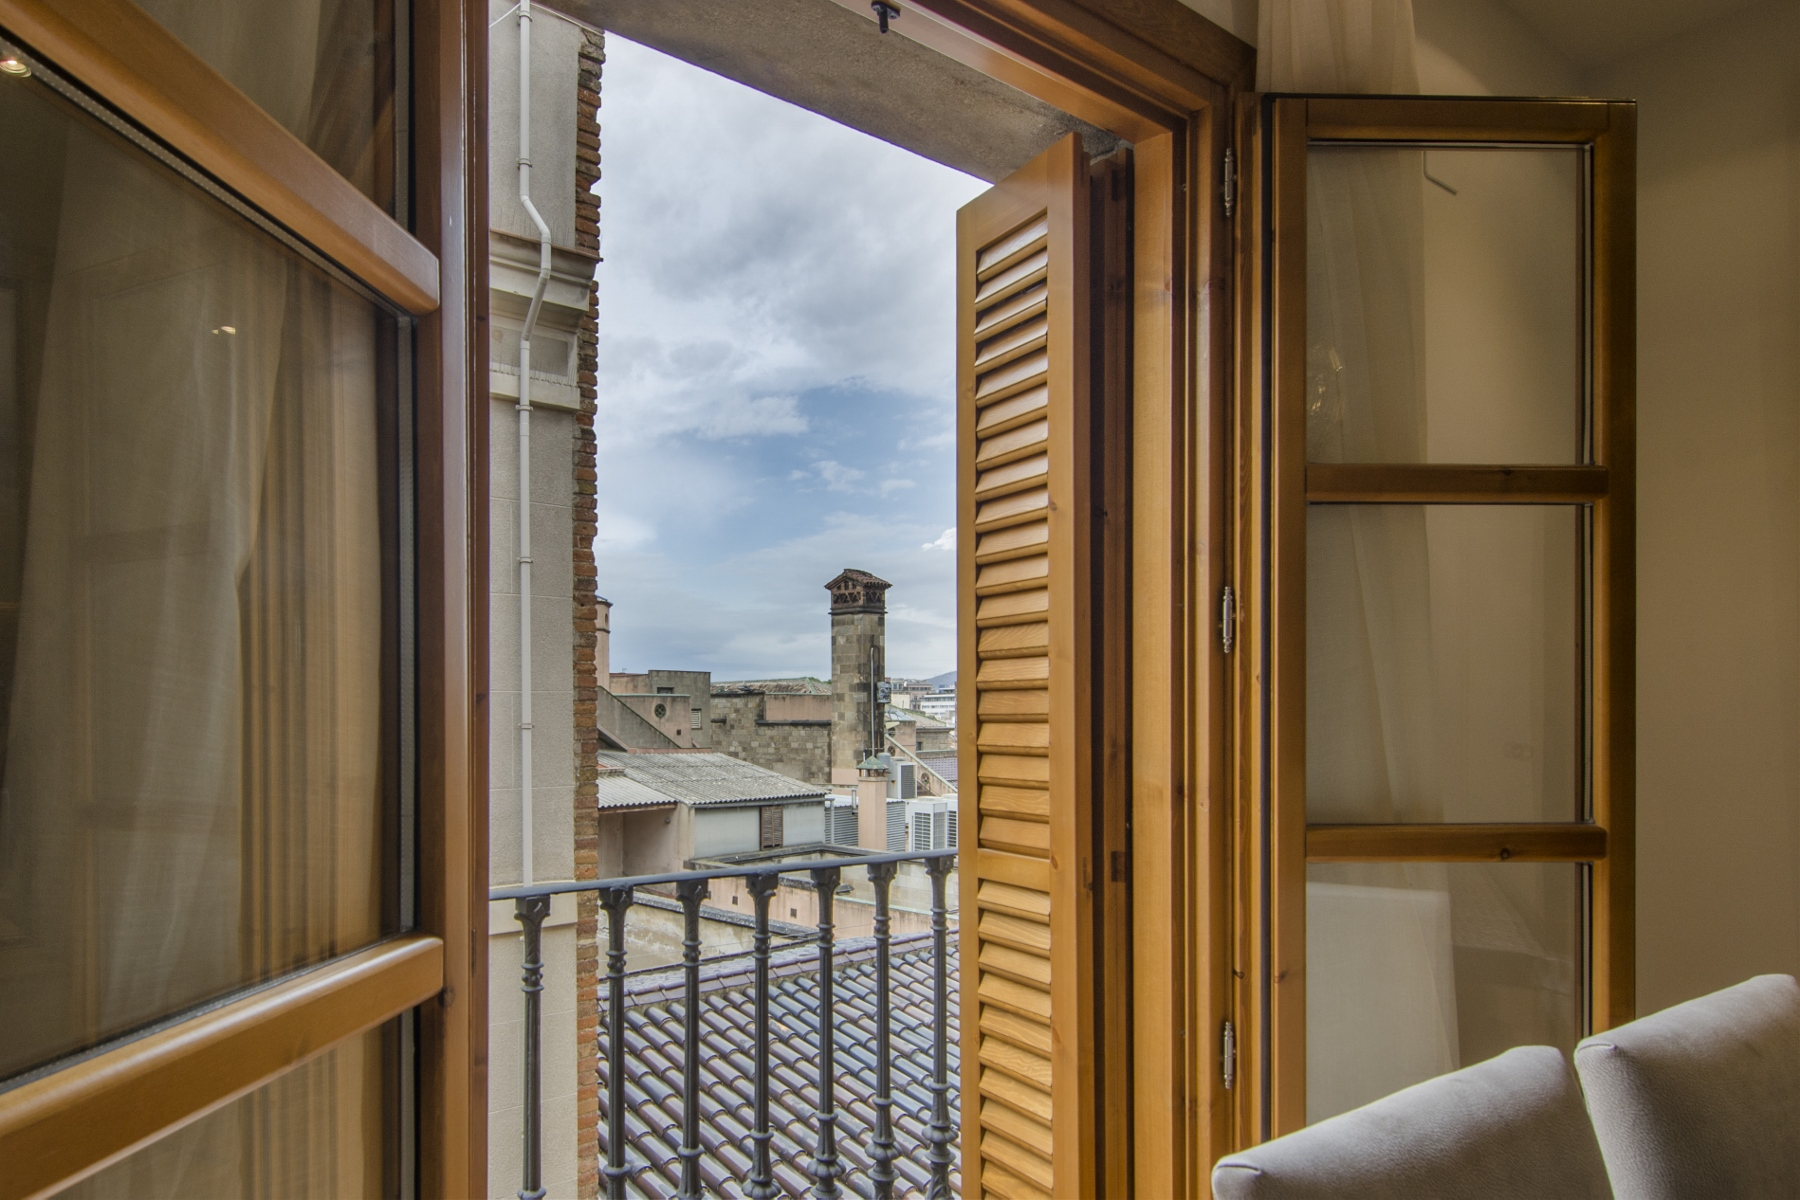 Wohnung für Verkauf beim New Promotion of Magnificent Residences Next to the Cathedral Old Town Ciutat Vella, Barcelona City, Barcelona 08002 Spanien